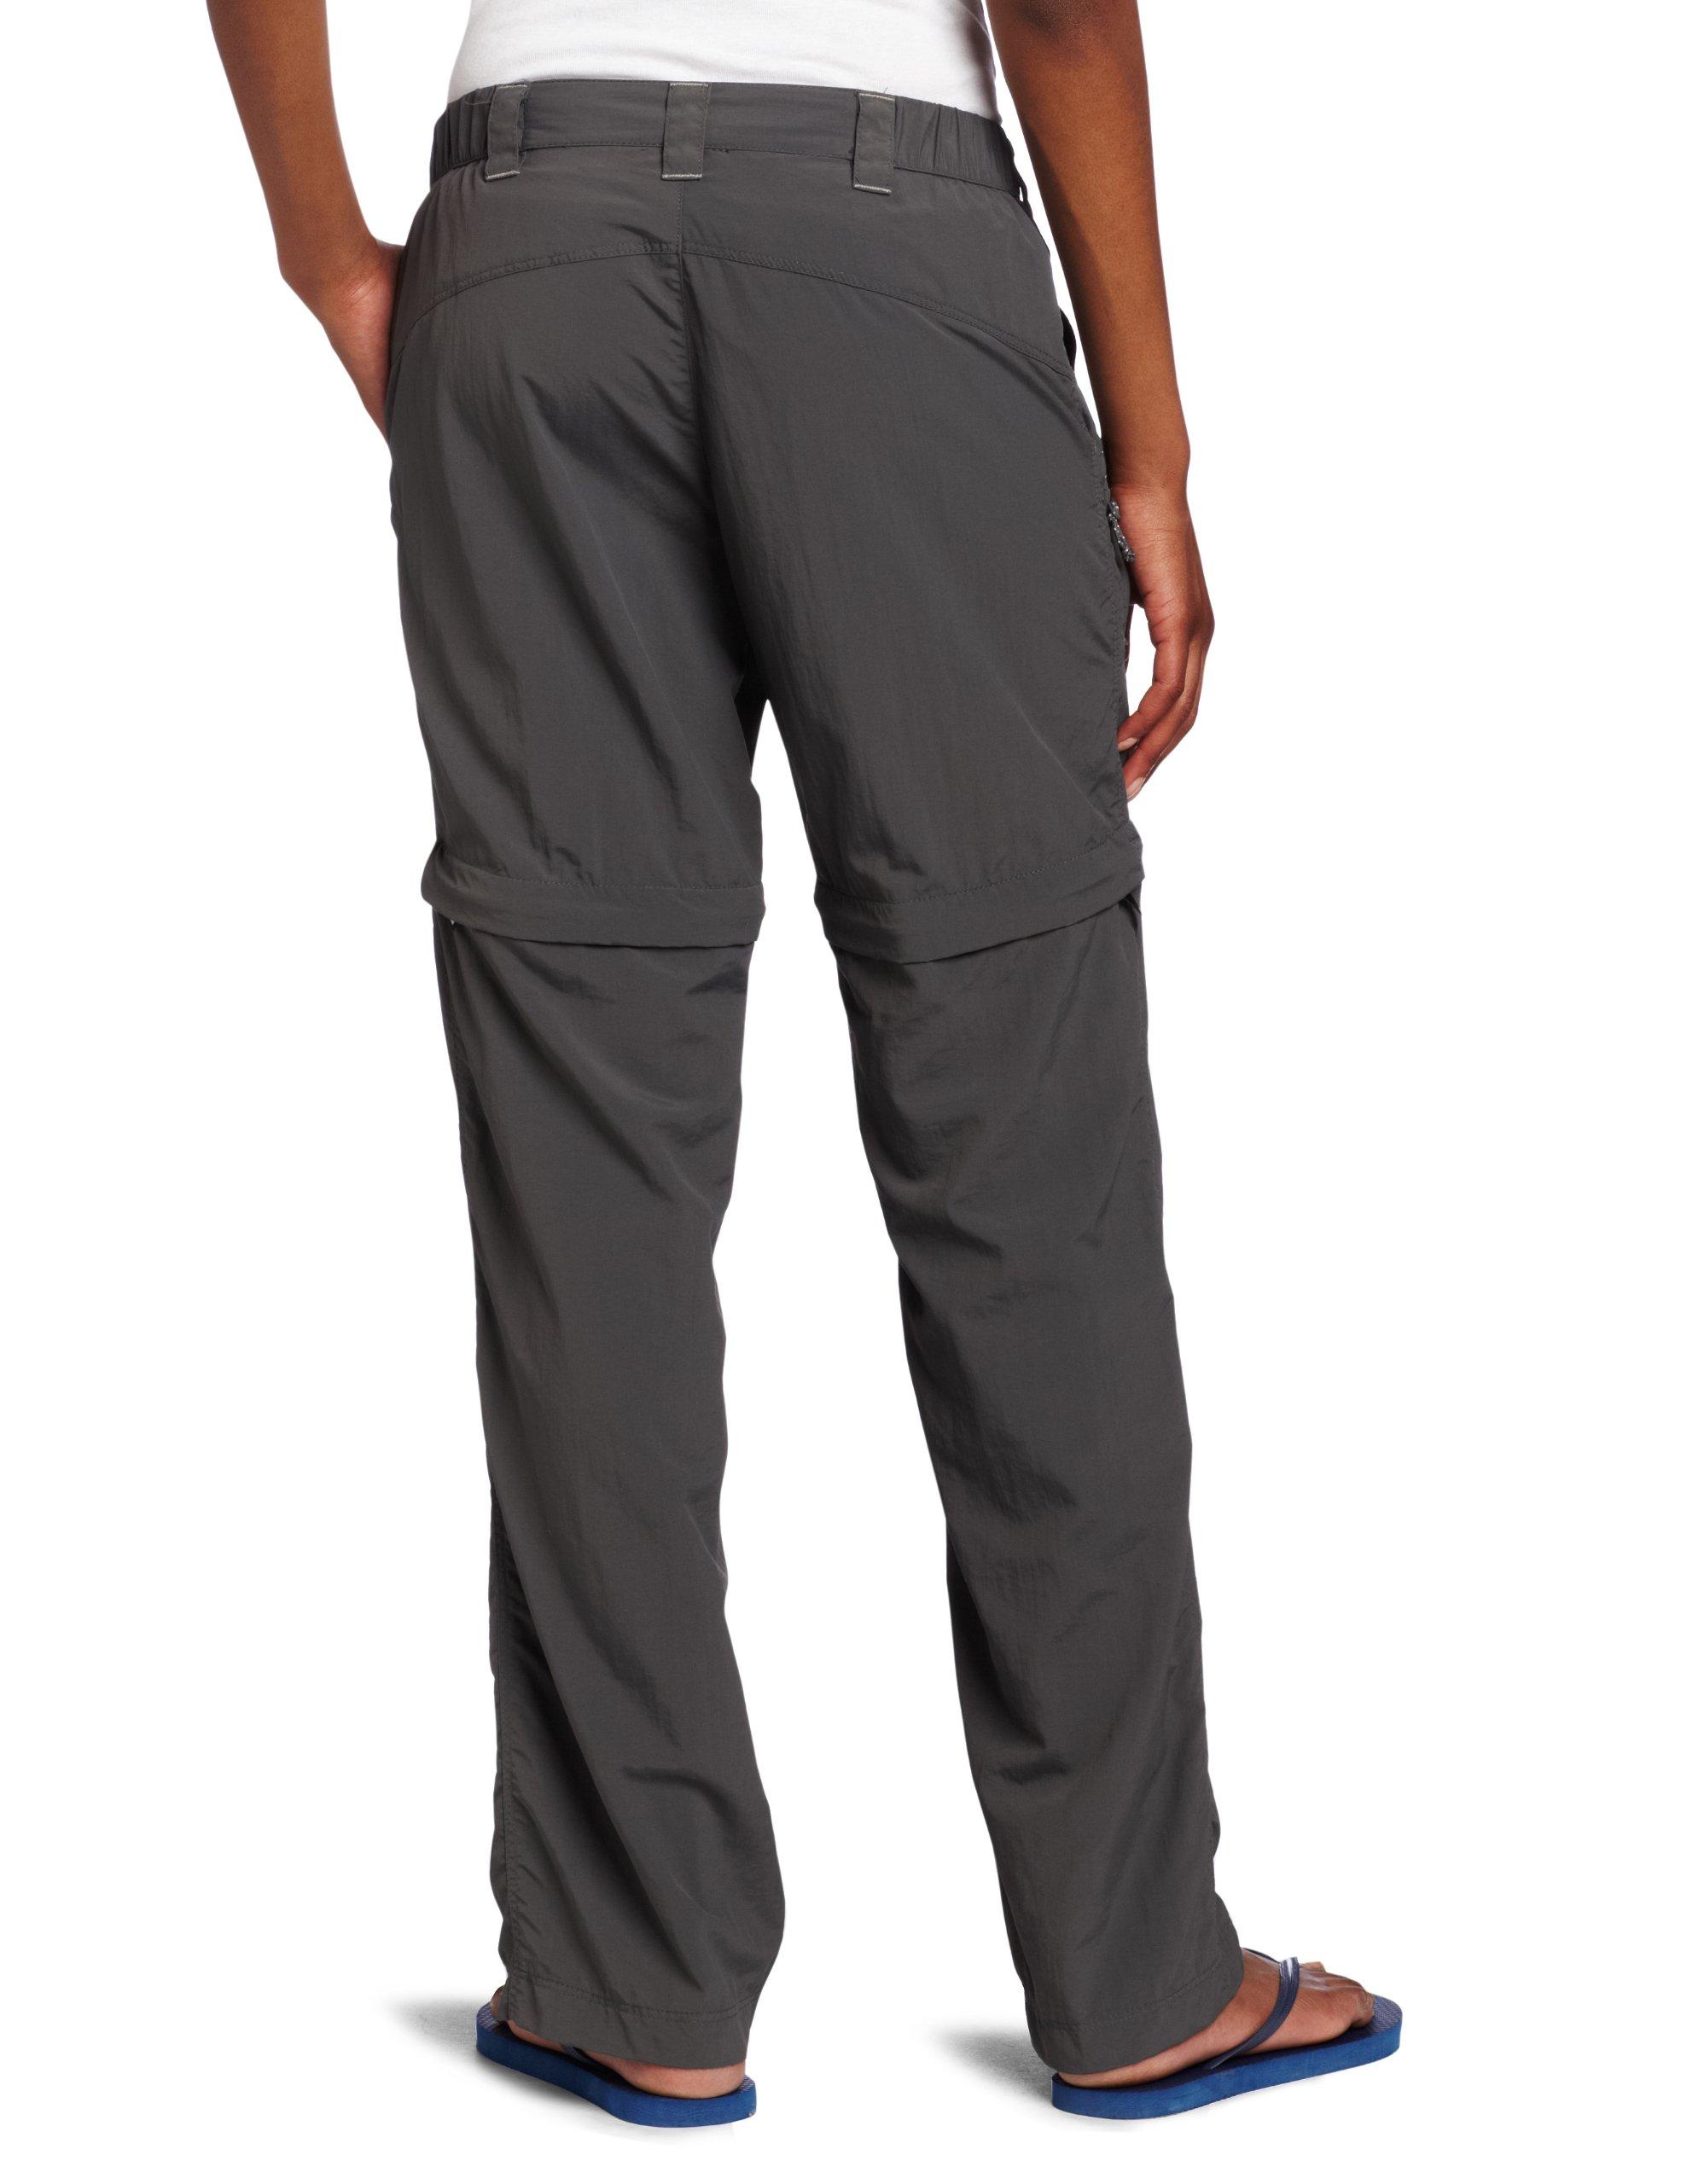 White Sierra Women's Sierra Pt. Convertible Pants - Extended Size, Caviar, 2X by White Sierra (Image #2)